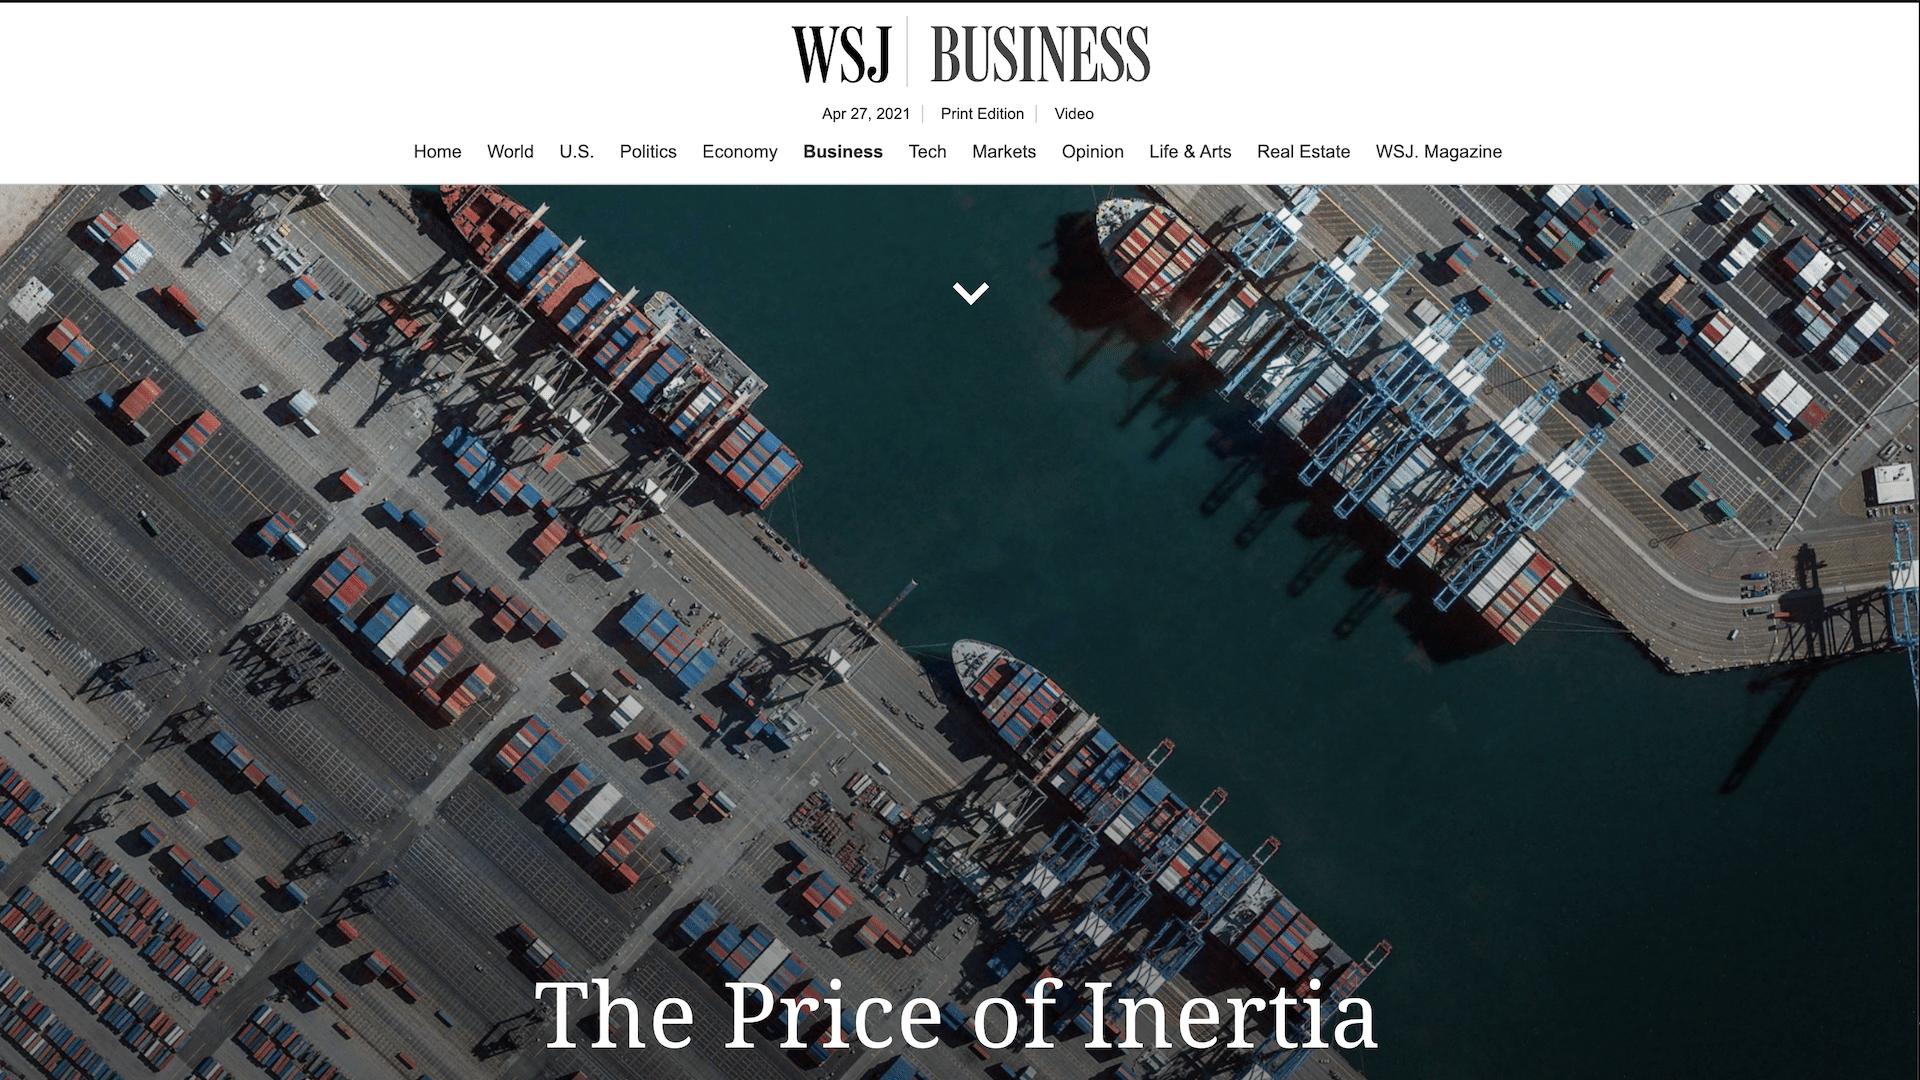 Wall Street Journal: The Price of Inertia